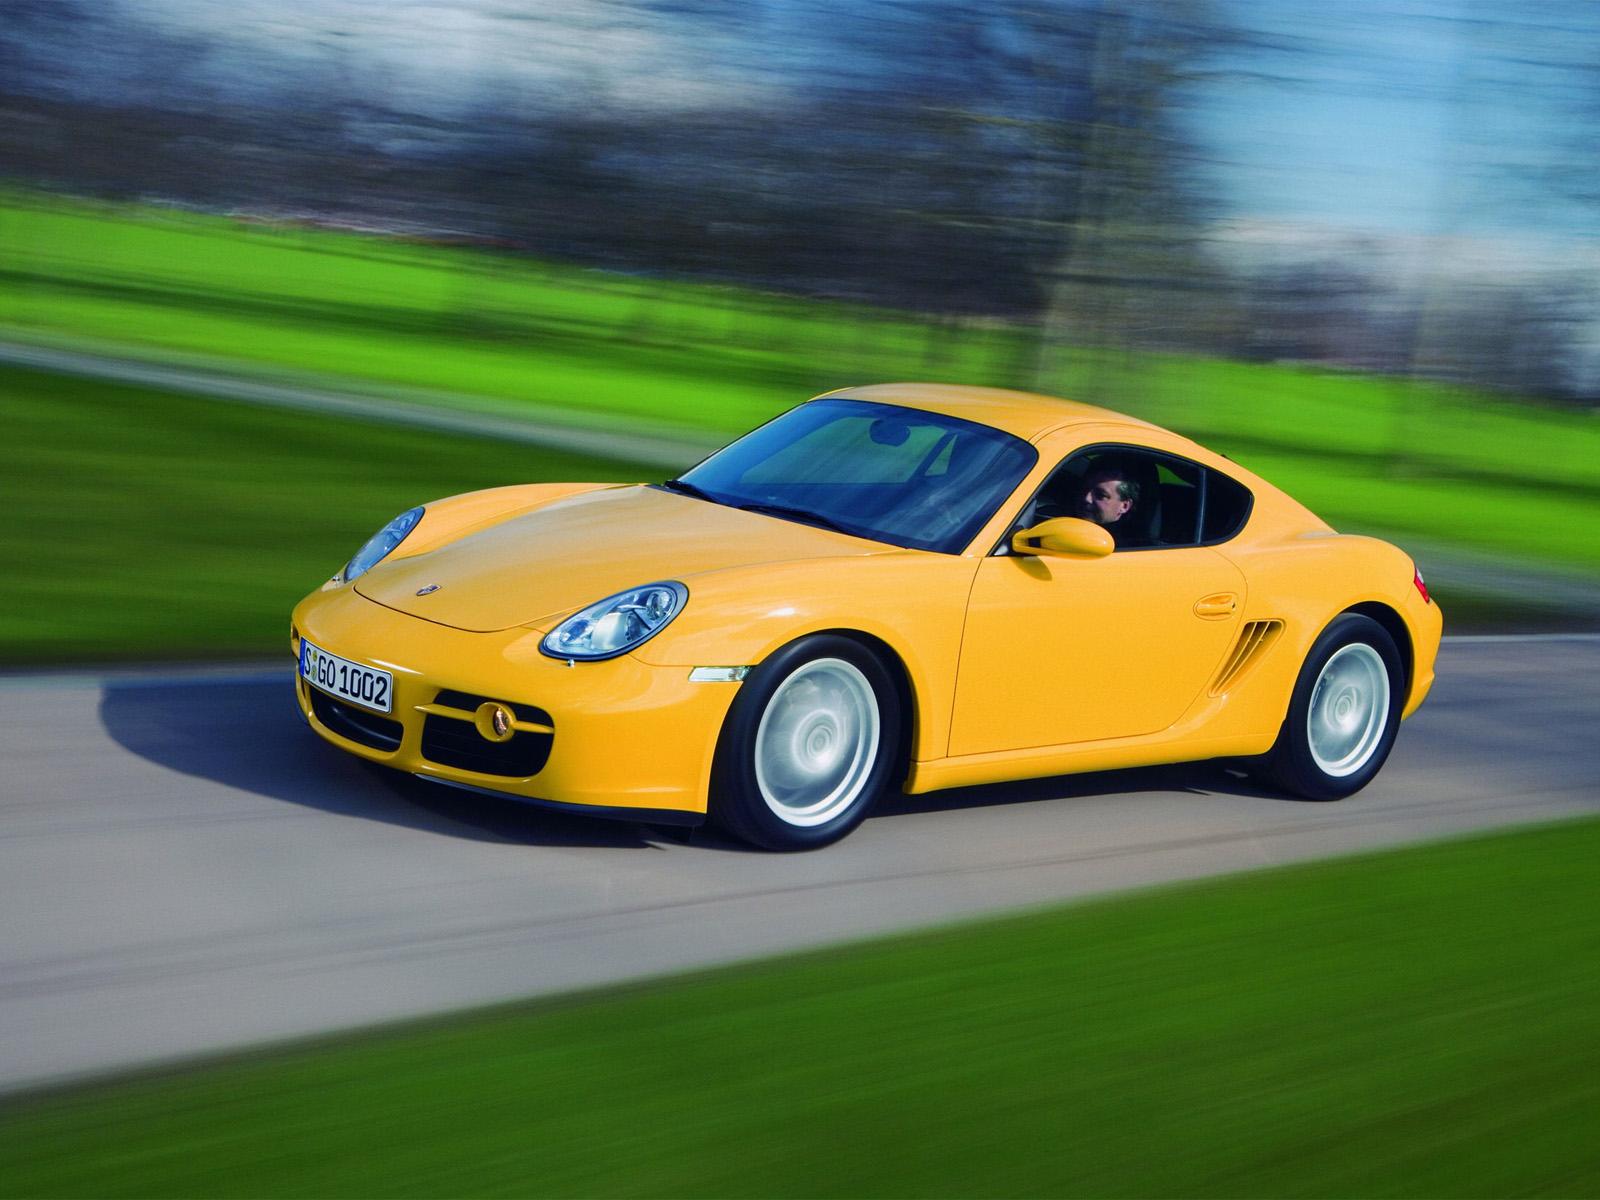 http://3.bp.blogspot.com/-t-Hb6UwfeiI/T4_gRLri3UI/AAAAAAAA3IU/-_XACR9xczs/s1600/Porsche+Cayman+Cars+Wallpapers+(1).jpg